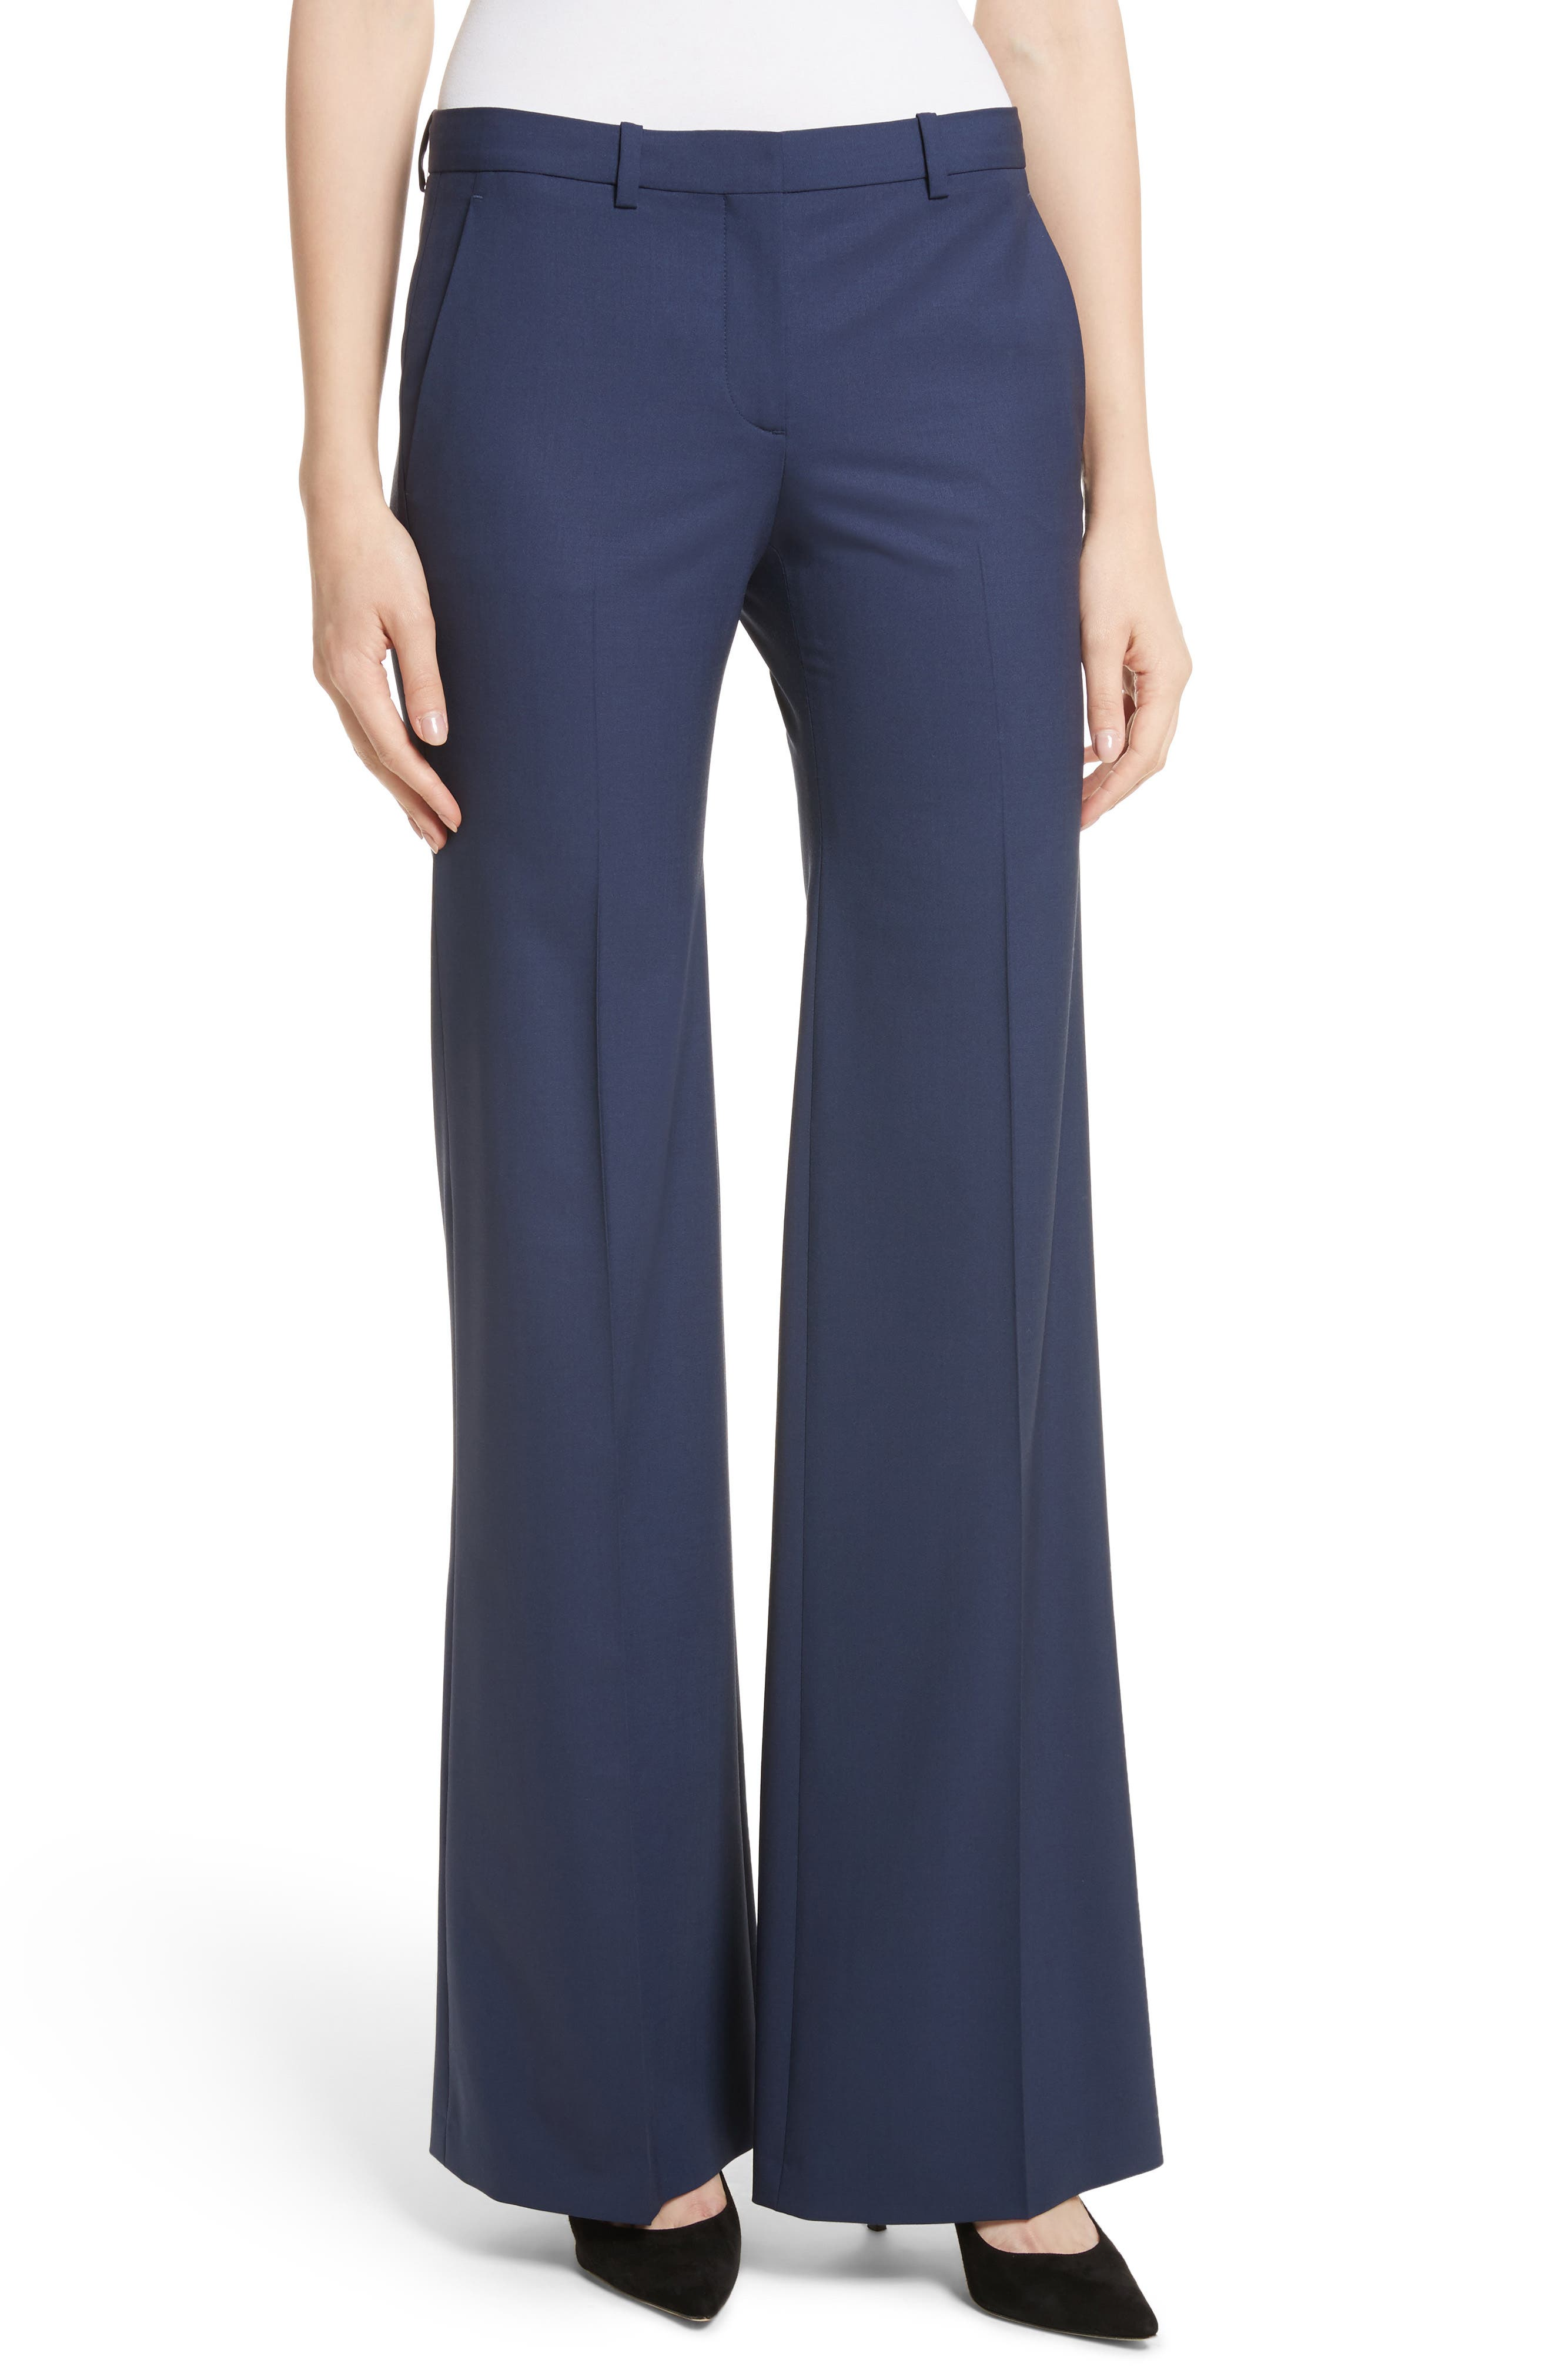 Alternate Image 1 Selected - Theory Demetria 2 Flare Leg Good Wool Suit Pants